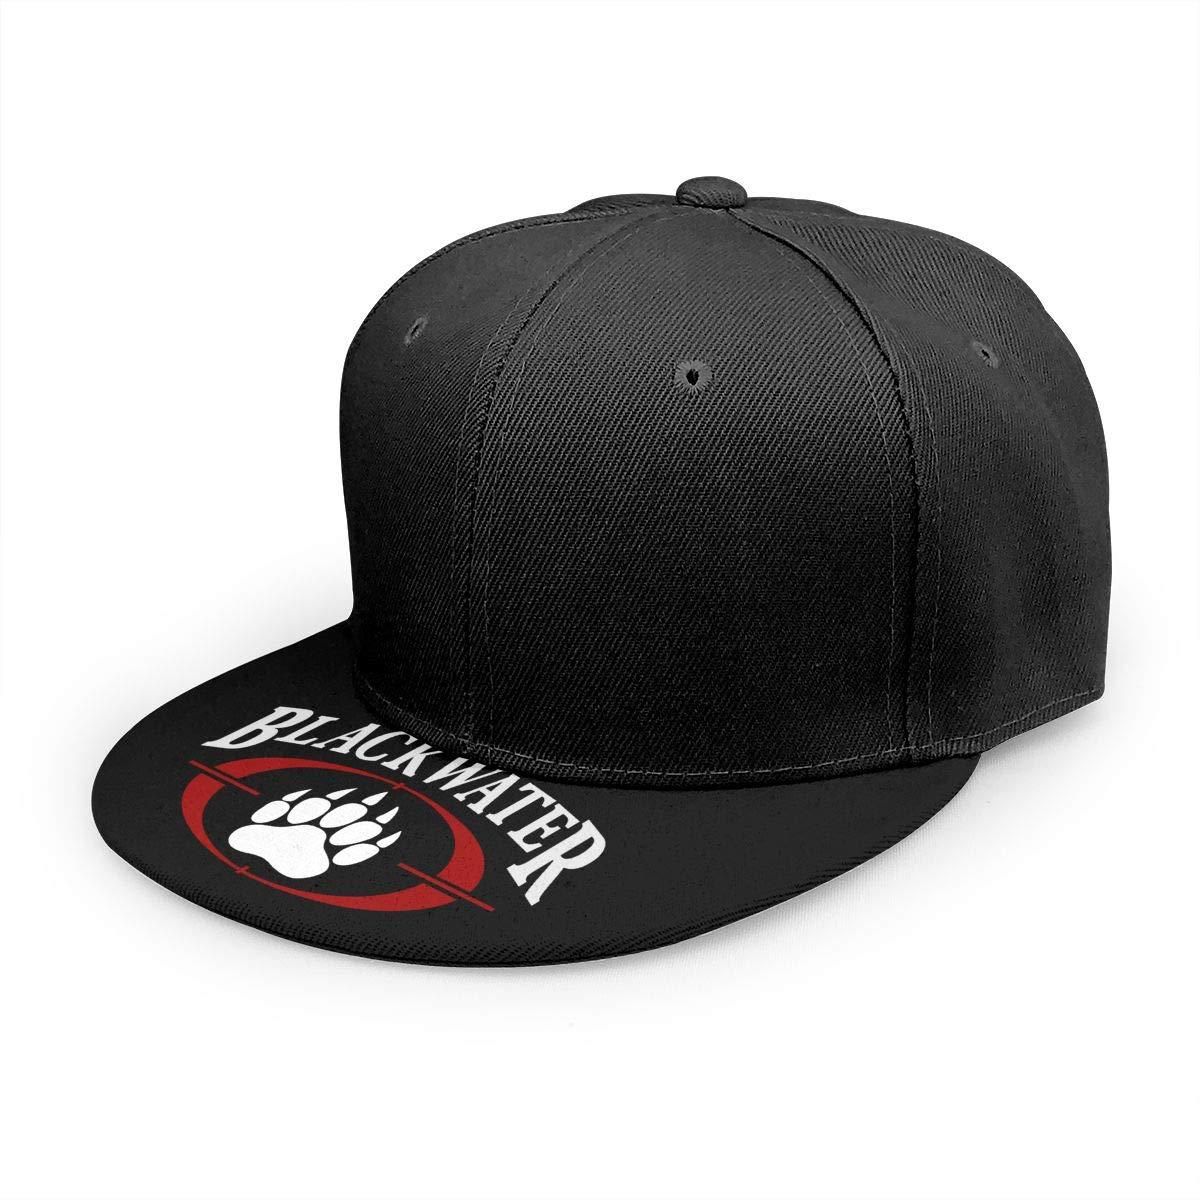 Adjustable Women Men Blackwater-Logo Print Baseball Cap Flat Brim Cap Hats Hip Hop Snapback Sun Hat Boys Girls Black by Apolonia